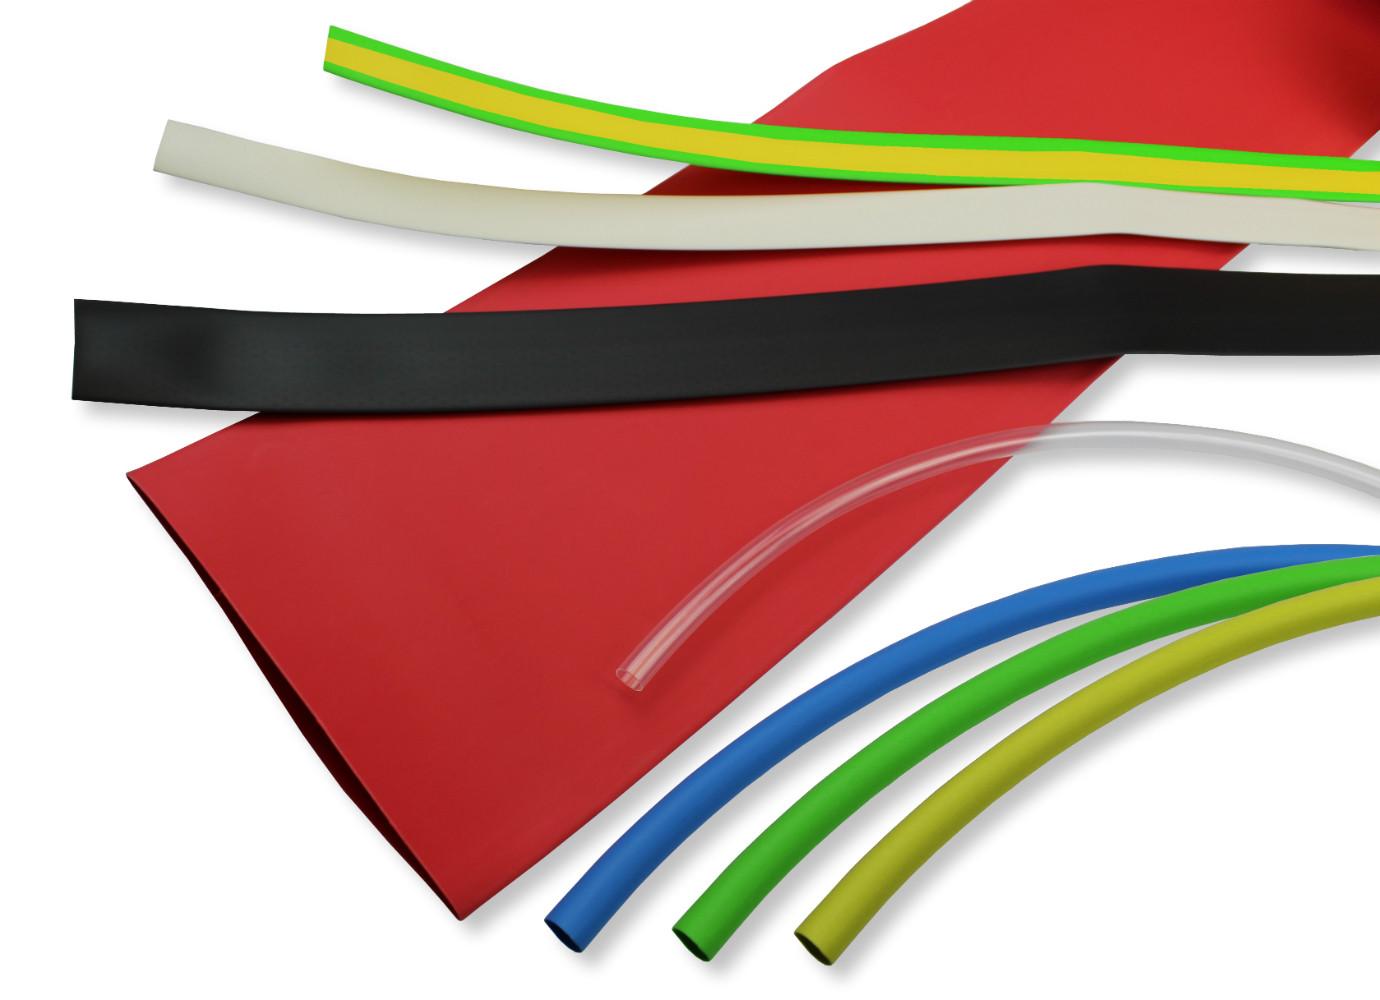 PREMIUM Heat Shrink Tubing 3:1 Ratio HSP3 size 24.0mm I.D / 8.0mm I.D White